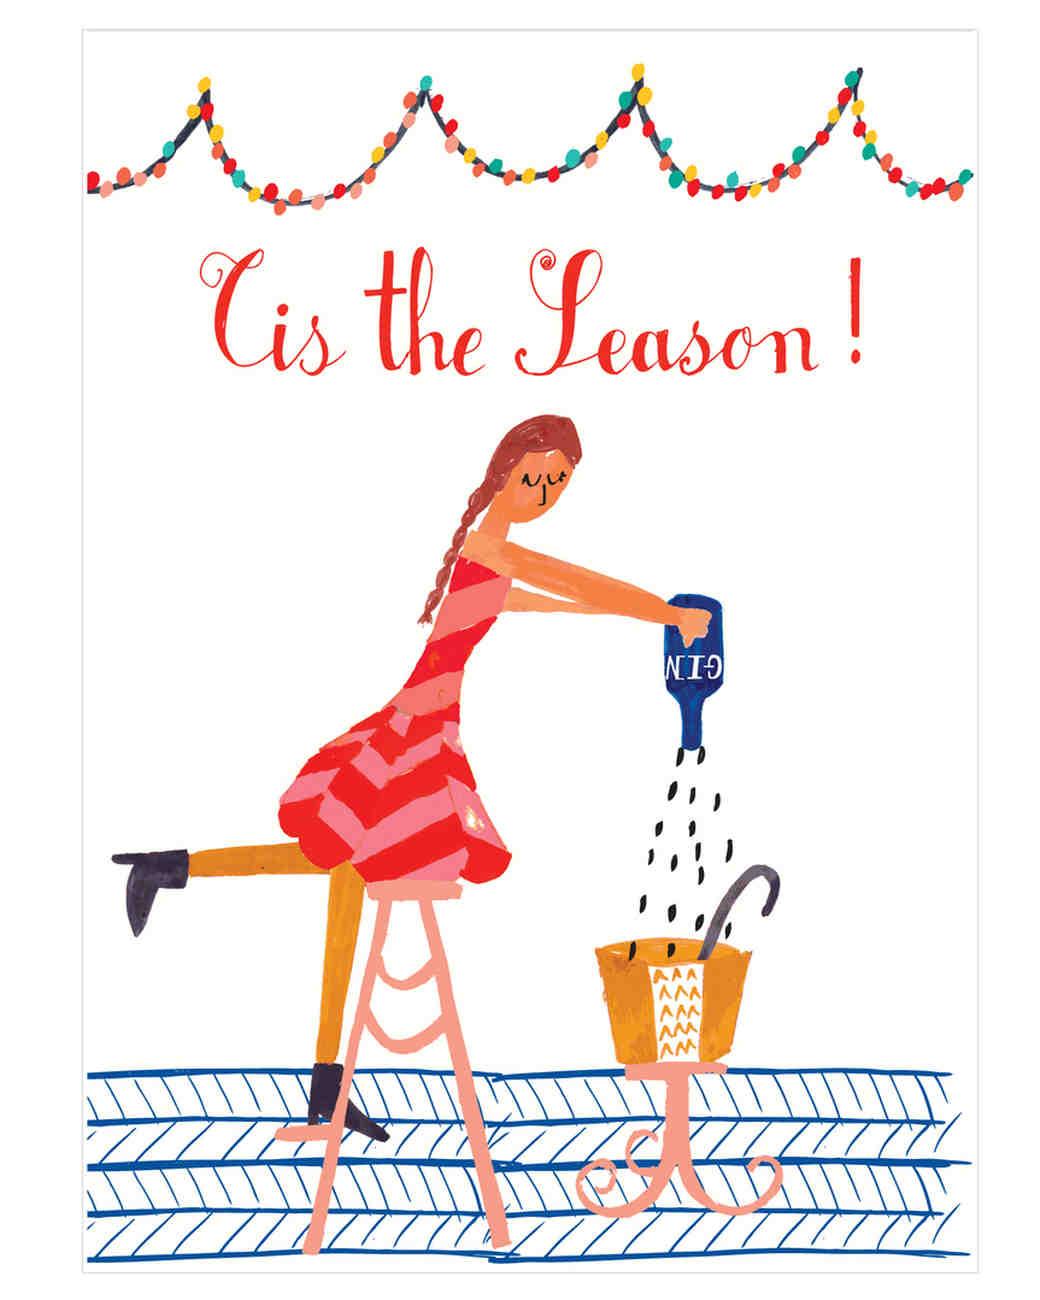 holiday-card-rebecca-ruebensaal-more-gin-please-1215.jpg